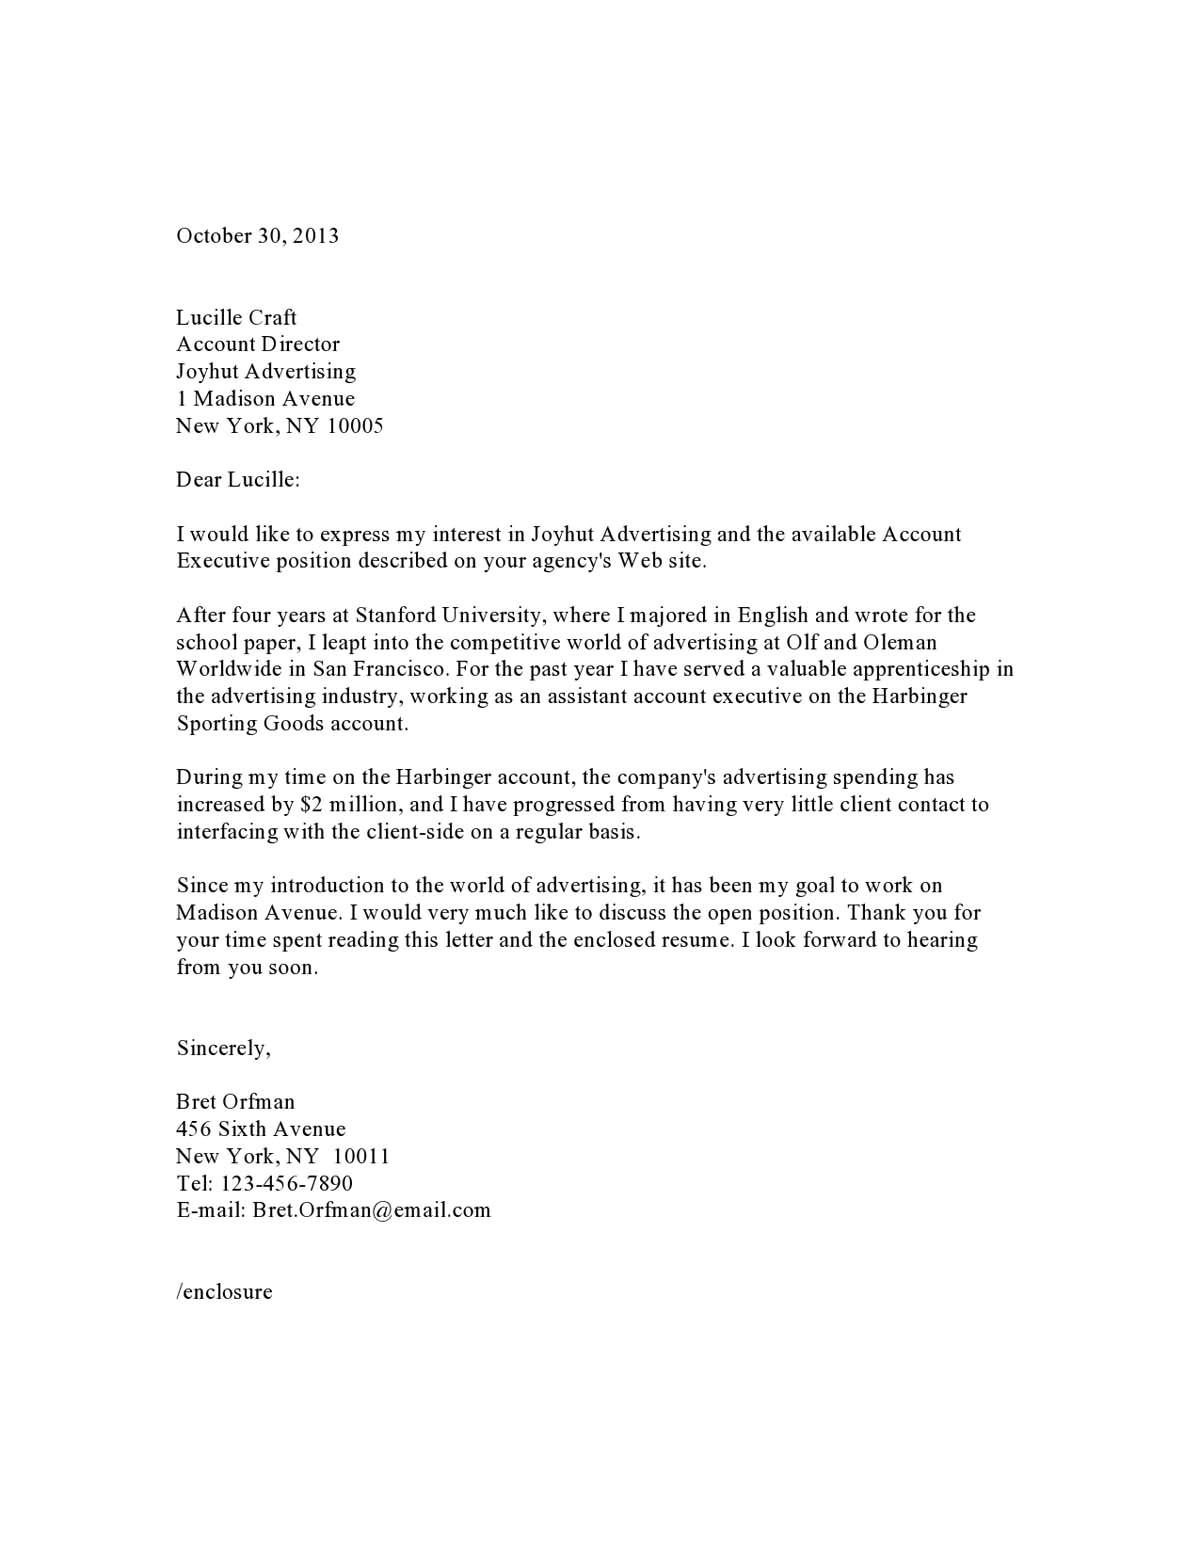 Cover Letter Sampes Download Cover Letter Professional Sample Pdf Templates